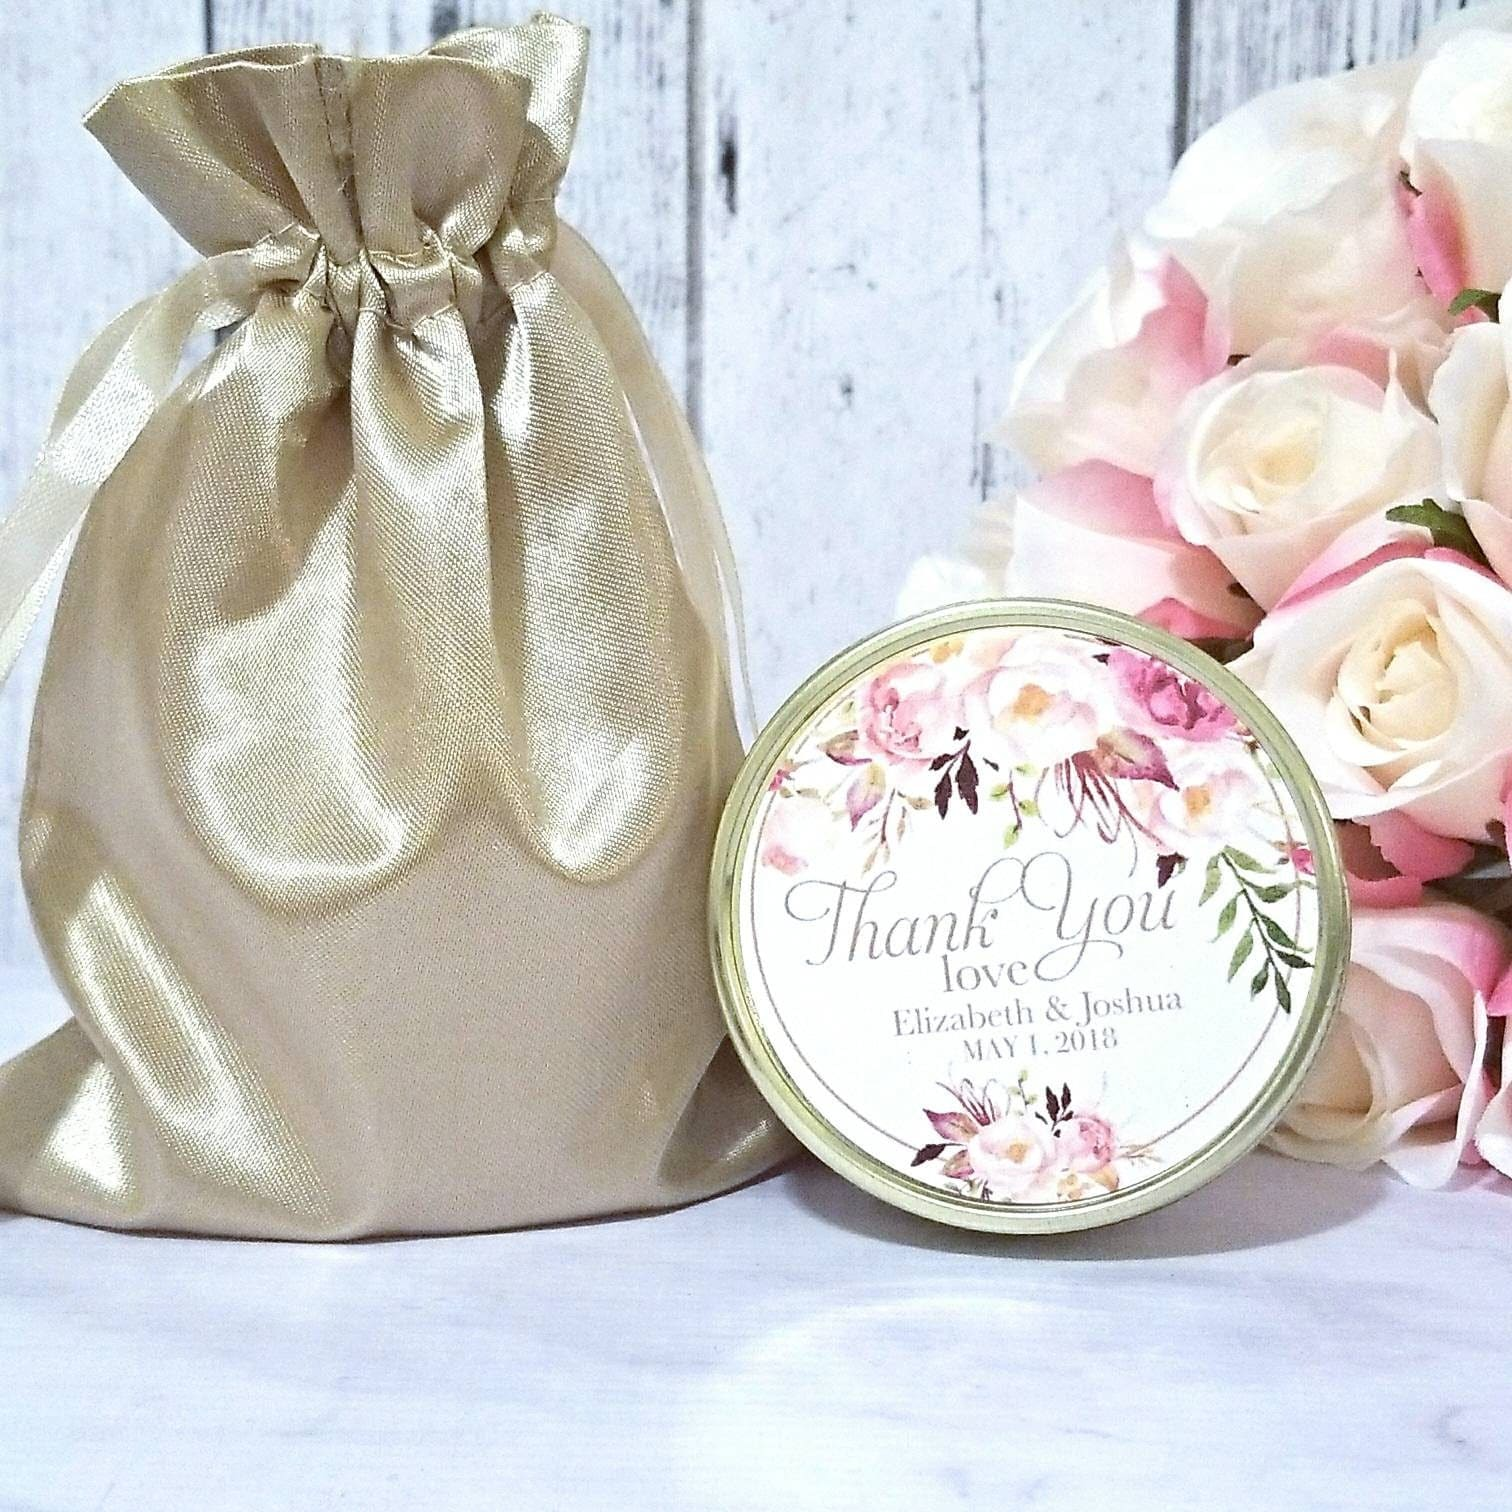 Blush Wedding Favors Candle Wedding Favors Candles Blush Wedding Gold Wedding Favors